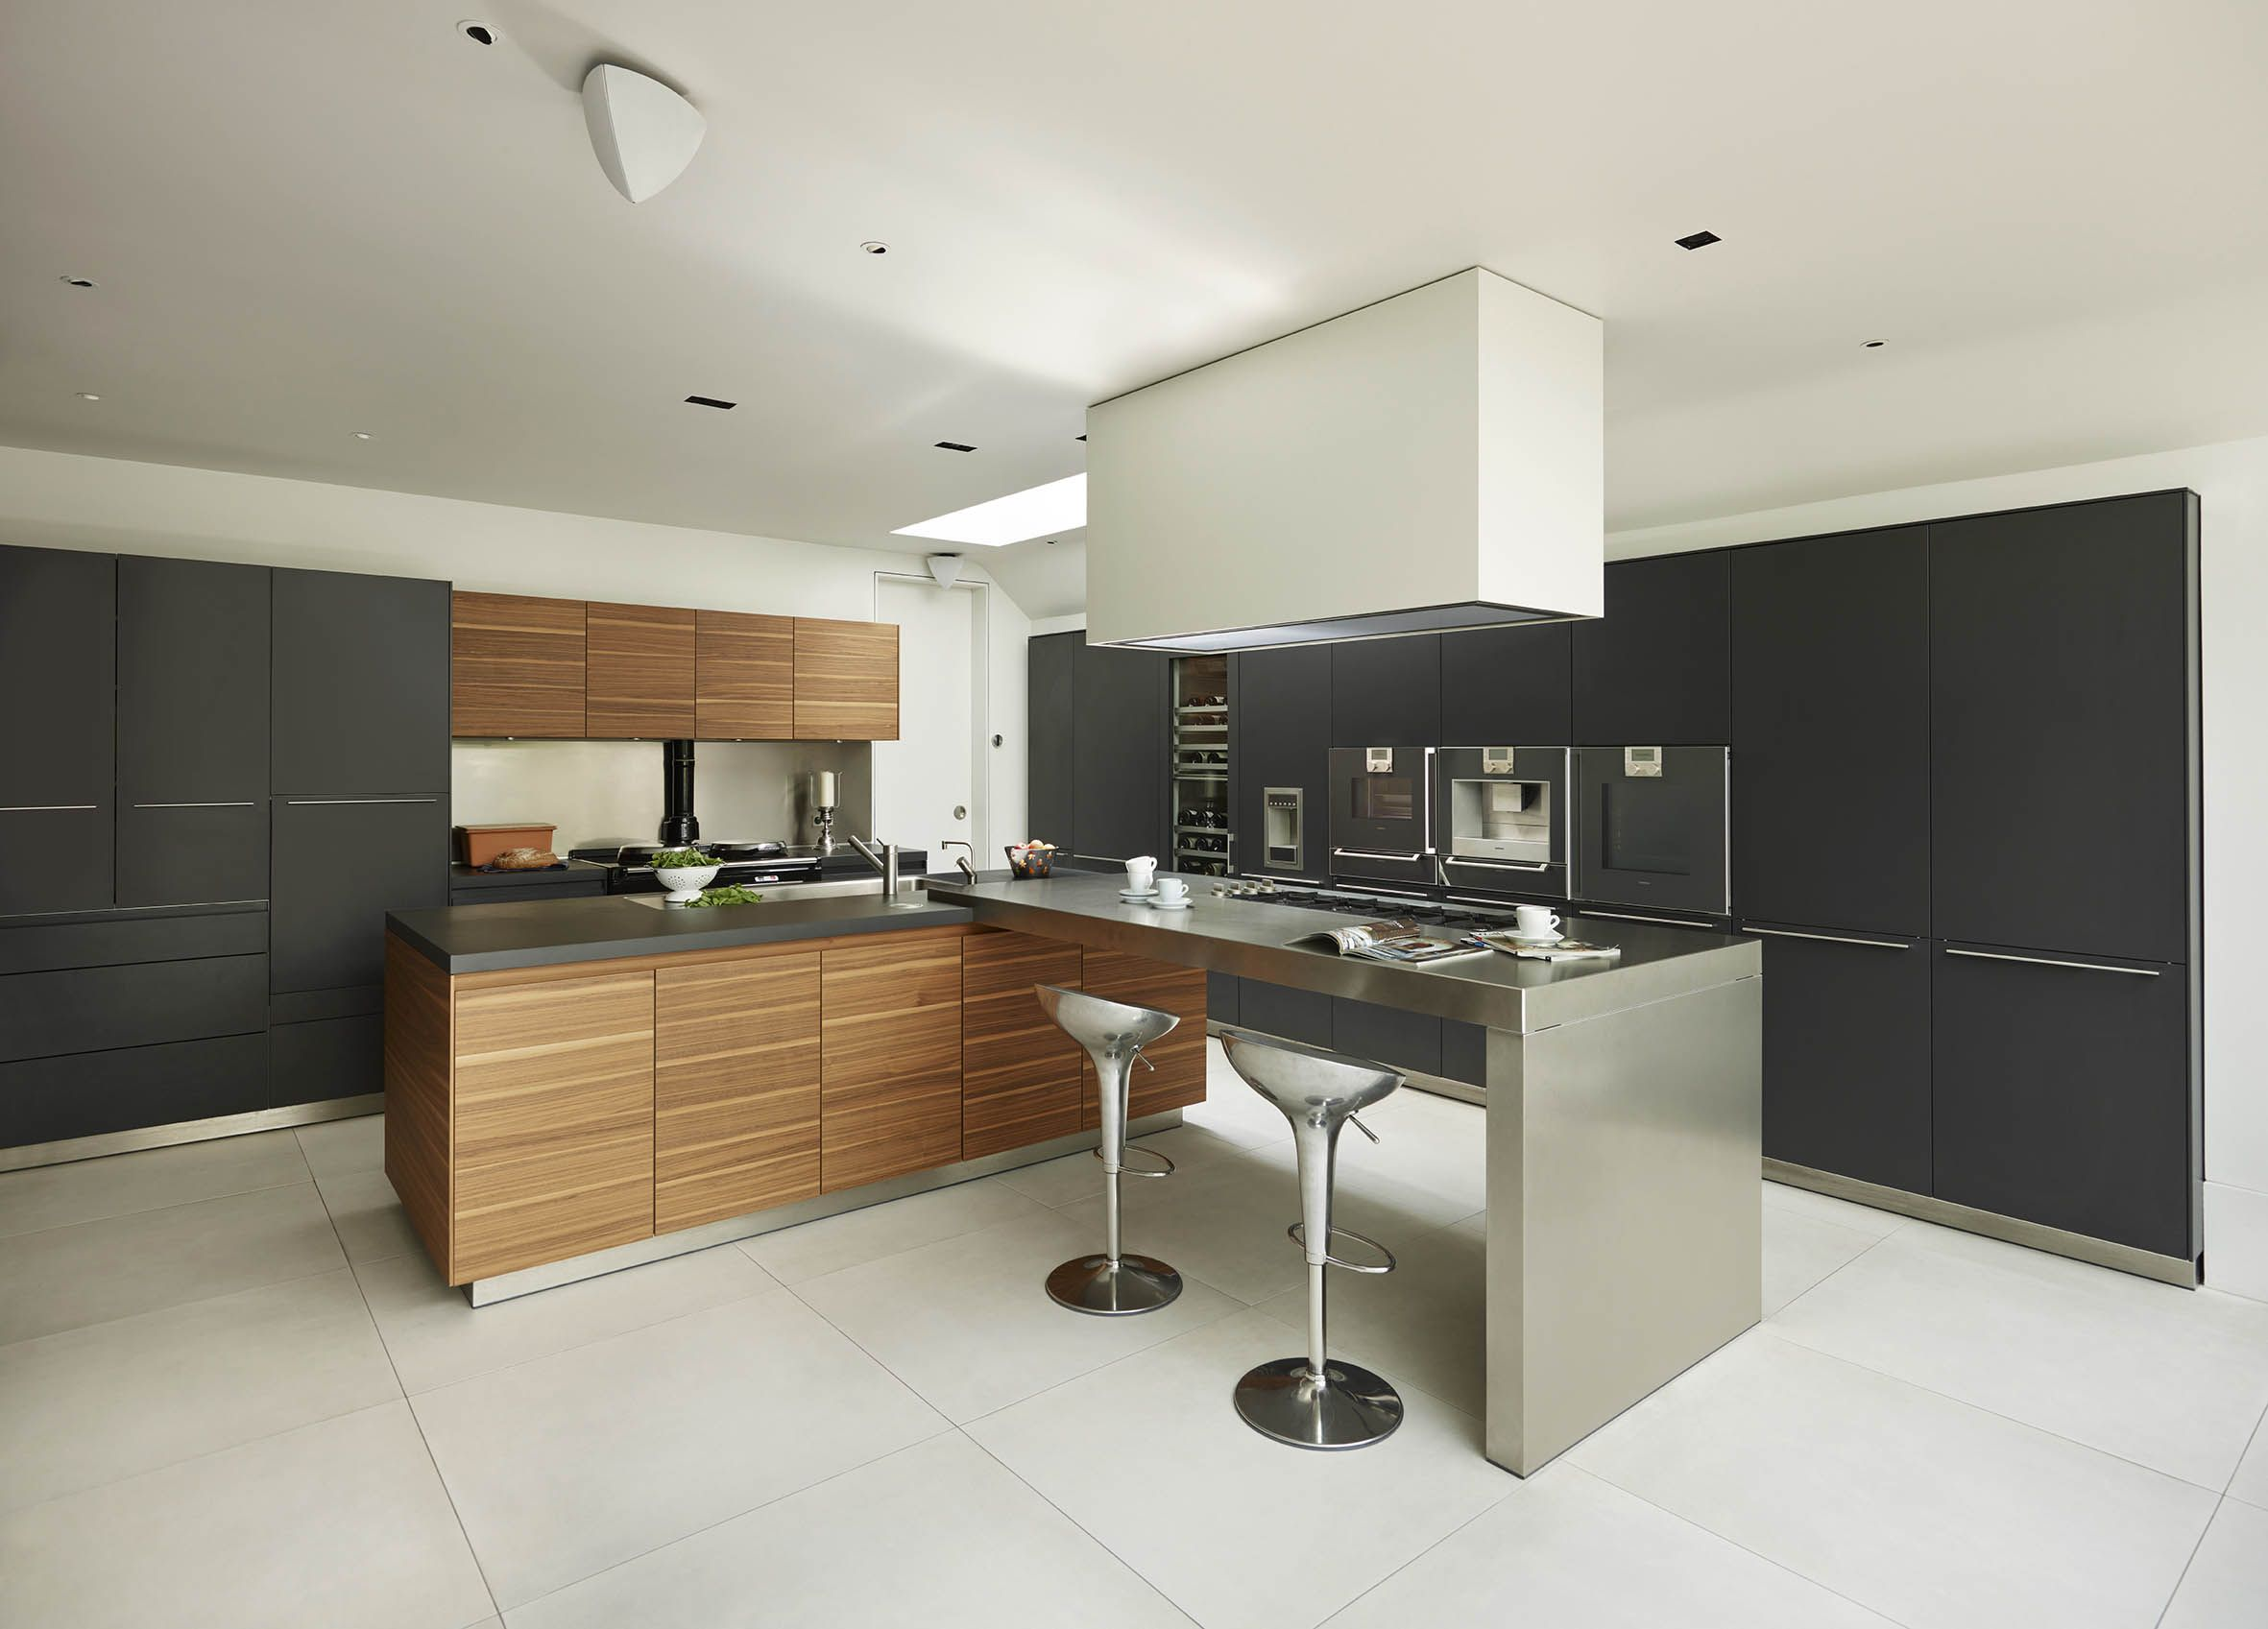 bulthaup by Kitchen Architecture #bulthaup #kitchenarchitecture ...